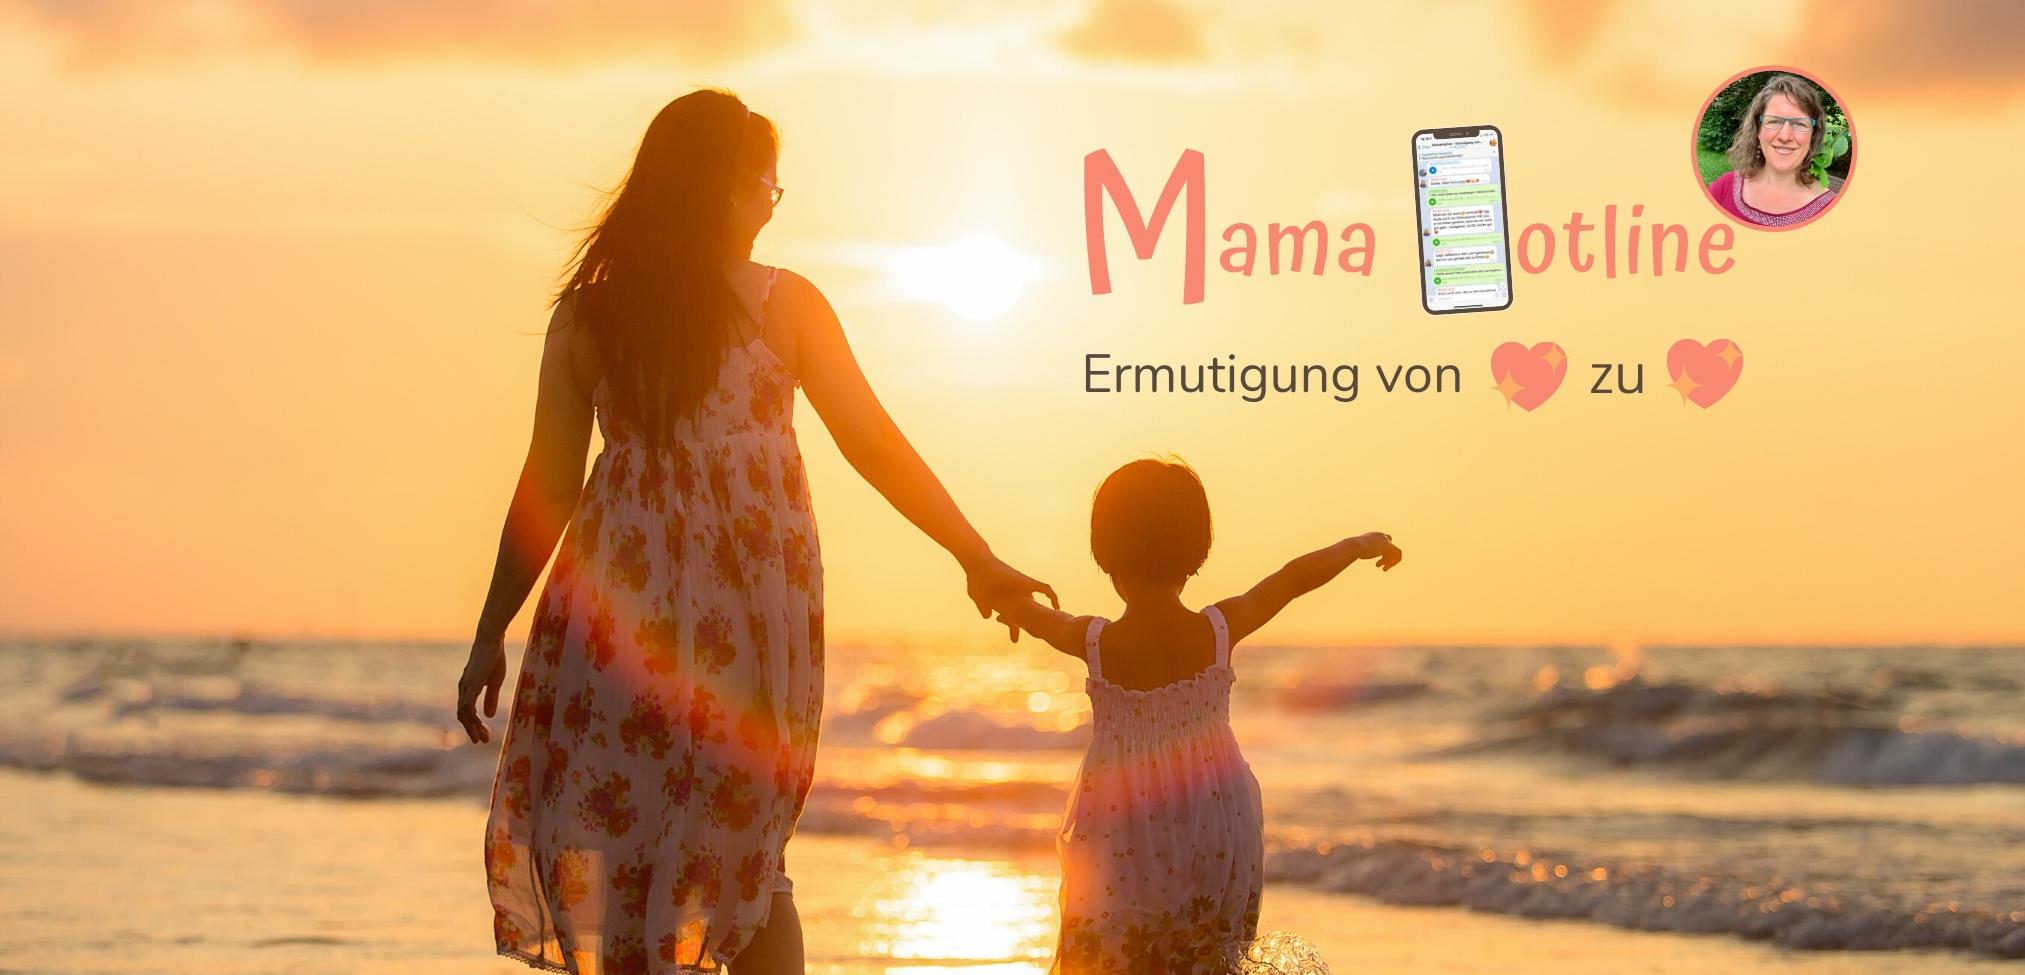 MamaHotline